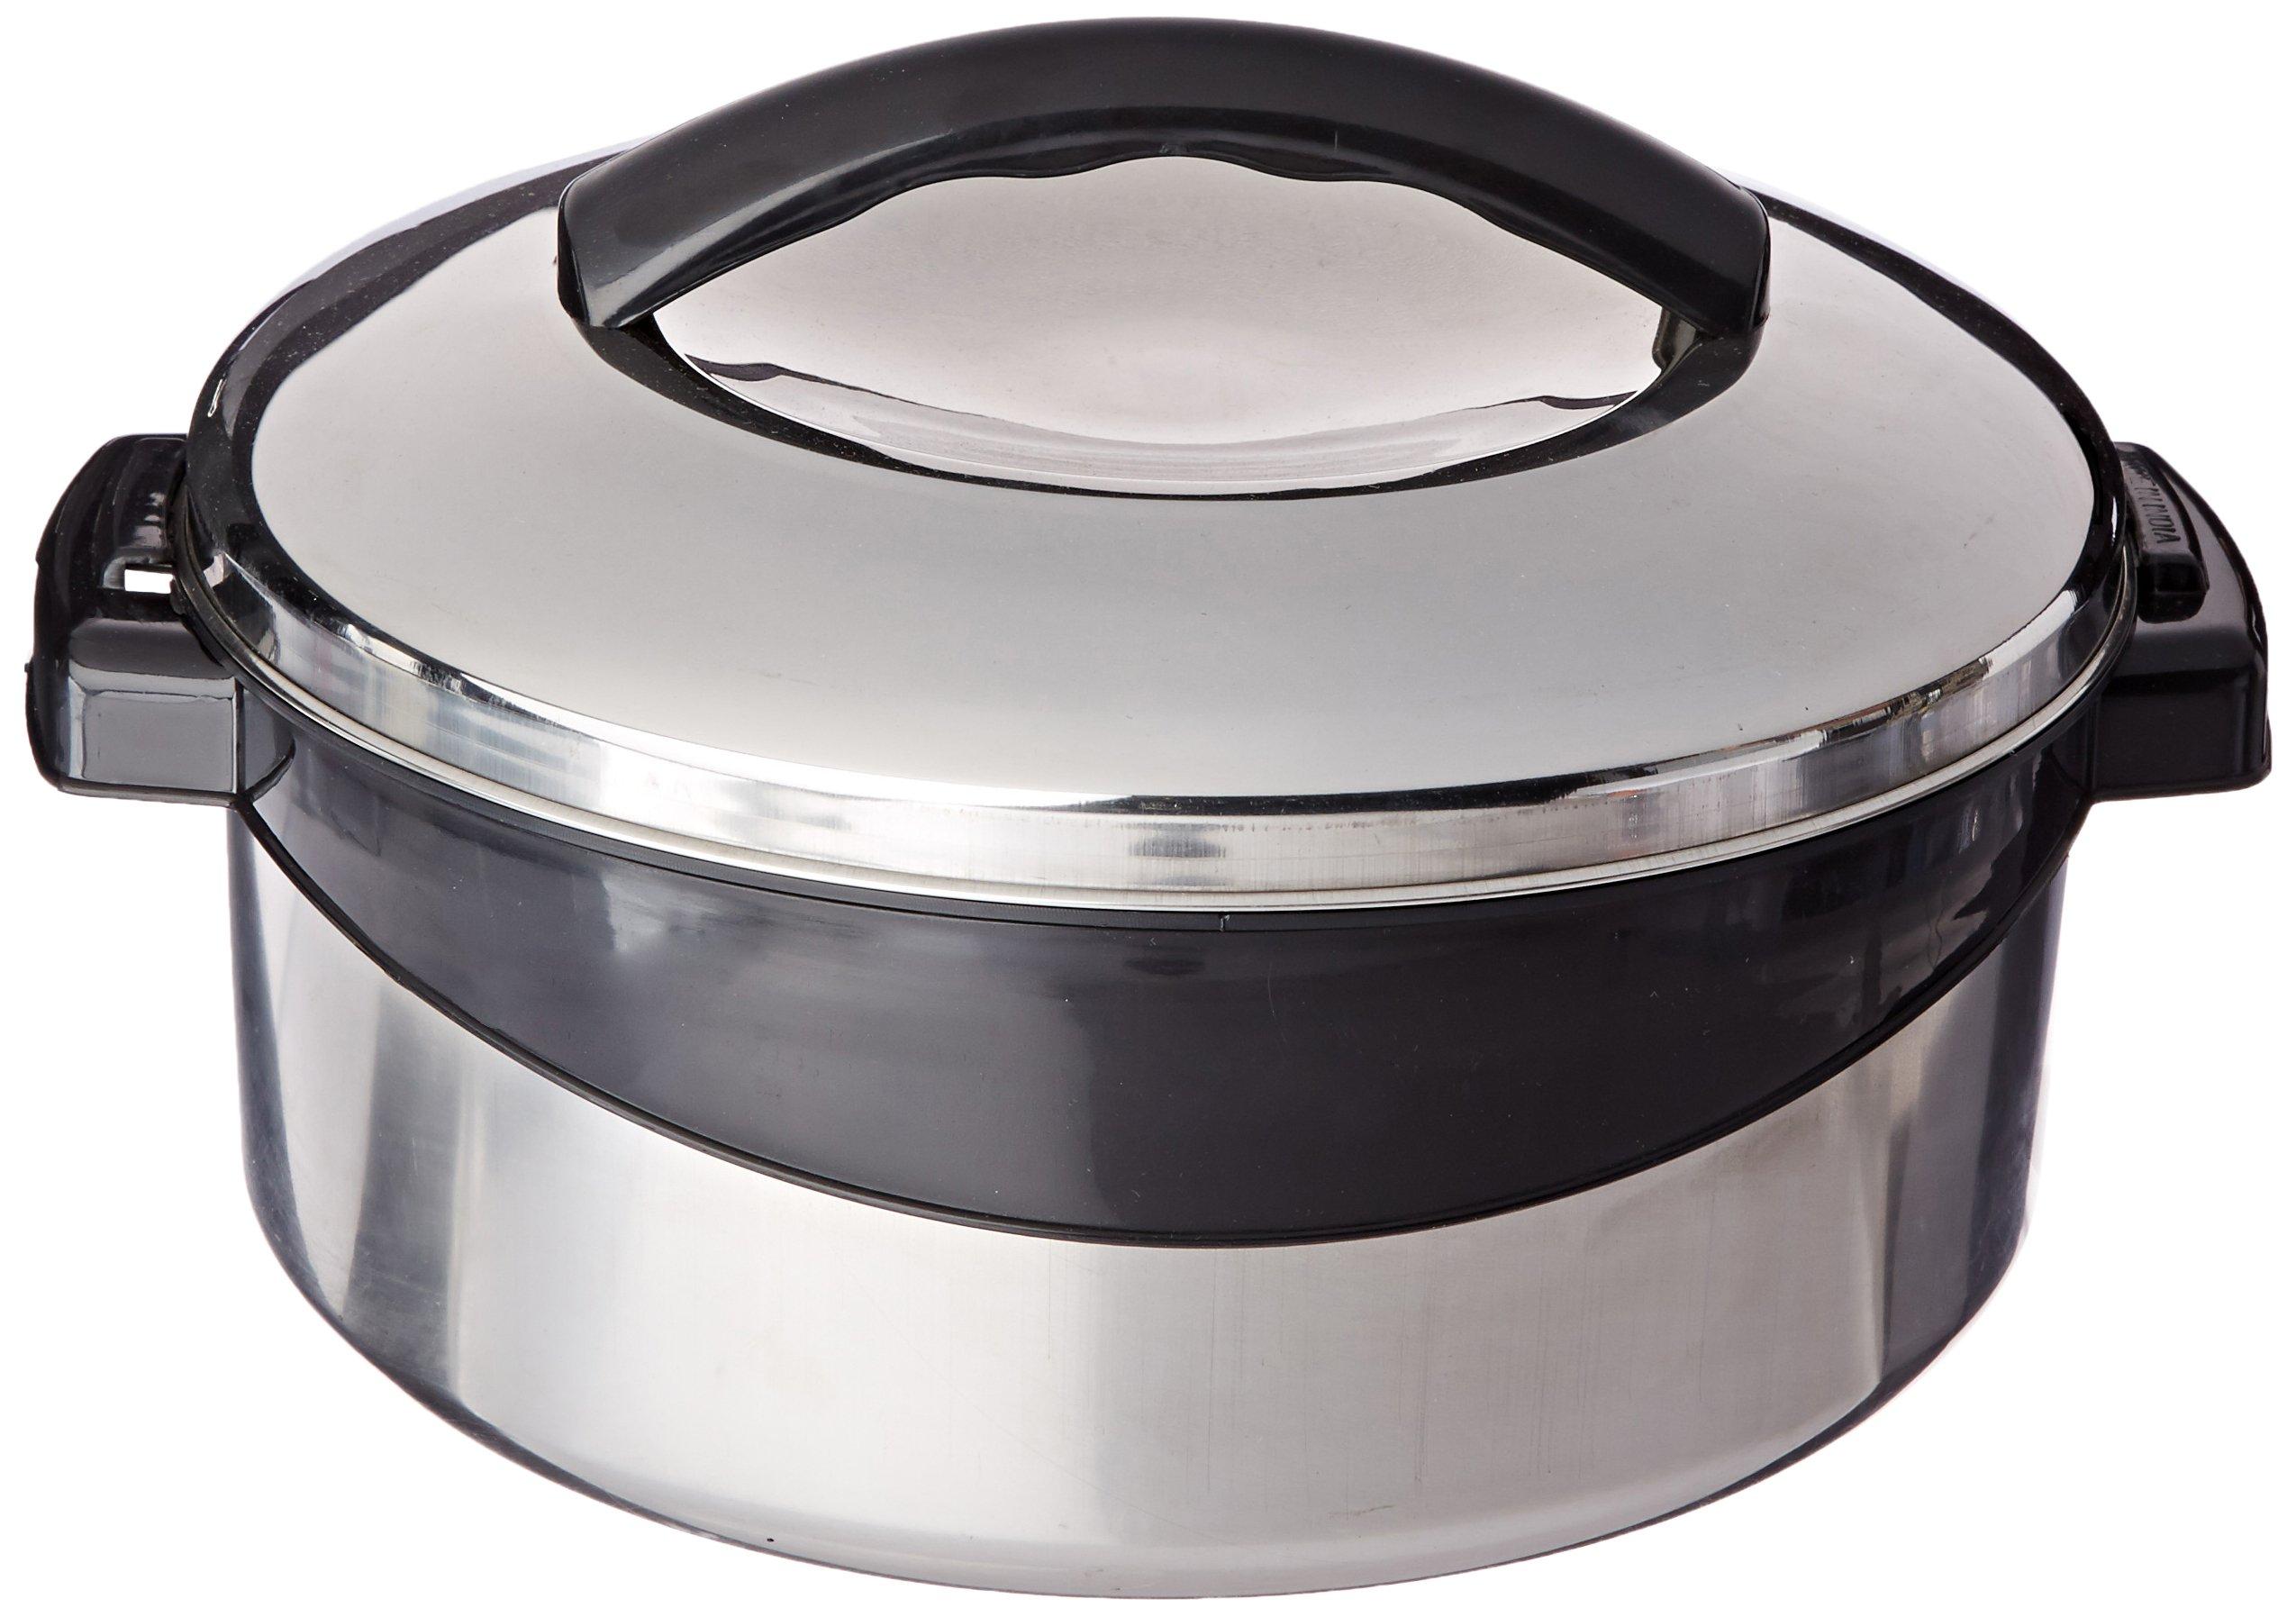 Milton Regent Hot Pot Insulated Casserole Keep Warm/Cold Upto 4-6 Hours, Stainless Steel, 2.5 Liter